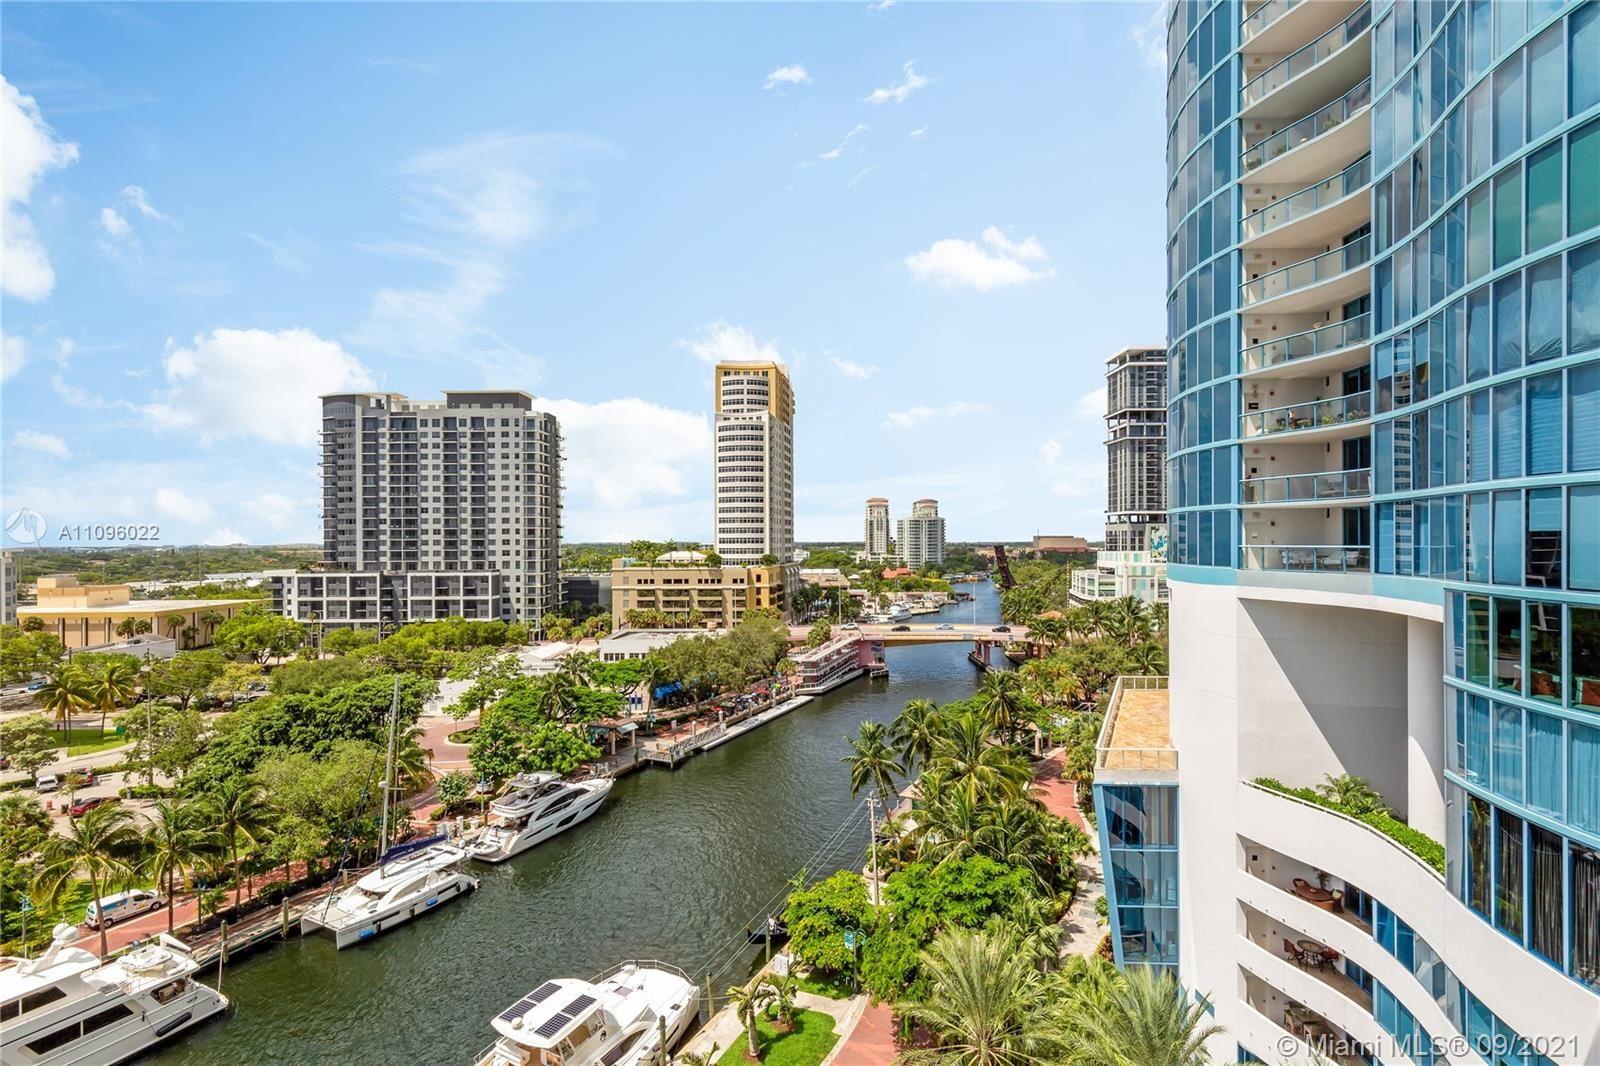 Photo of 333 Las Olas Way #1010, Fort Lauderdale, FL 33301 (MLS # A11096022)